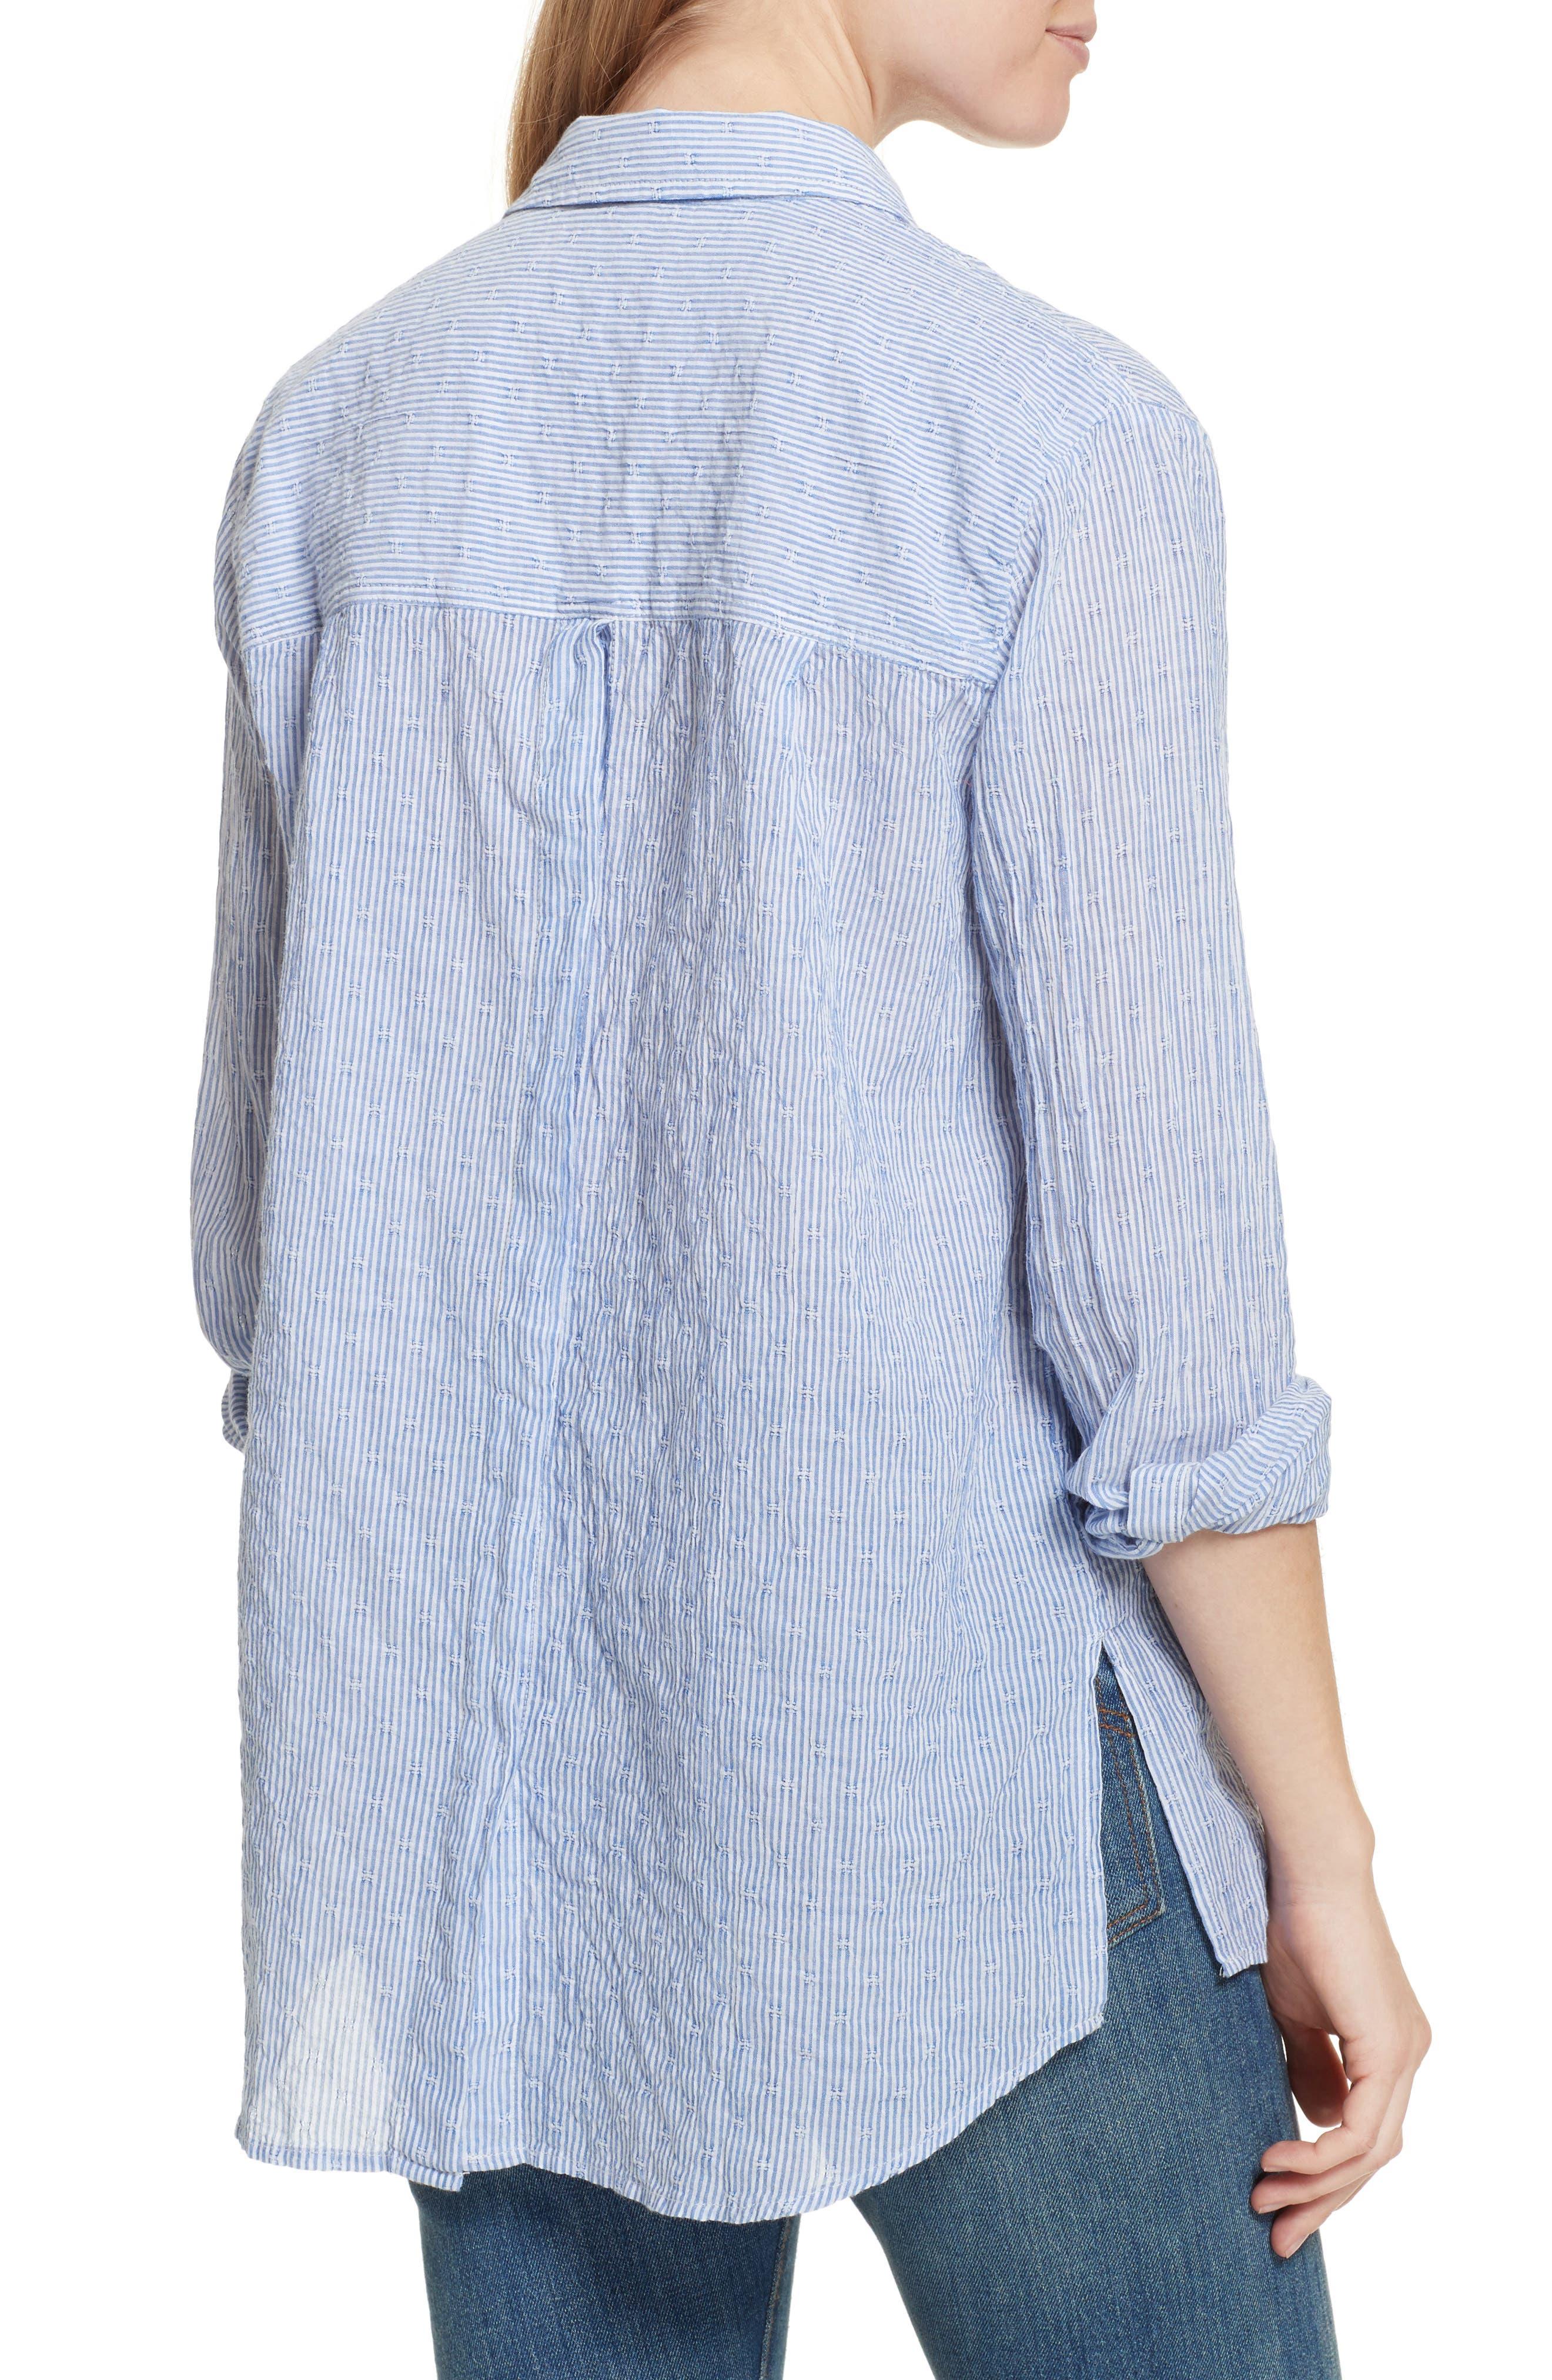 No Limits Stripe Stretch Cotton Shirt,                             Alternate thumbnail 2, color,                             400